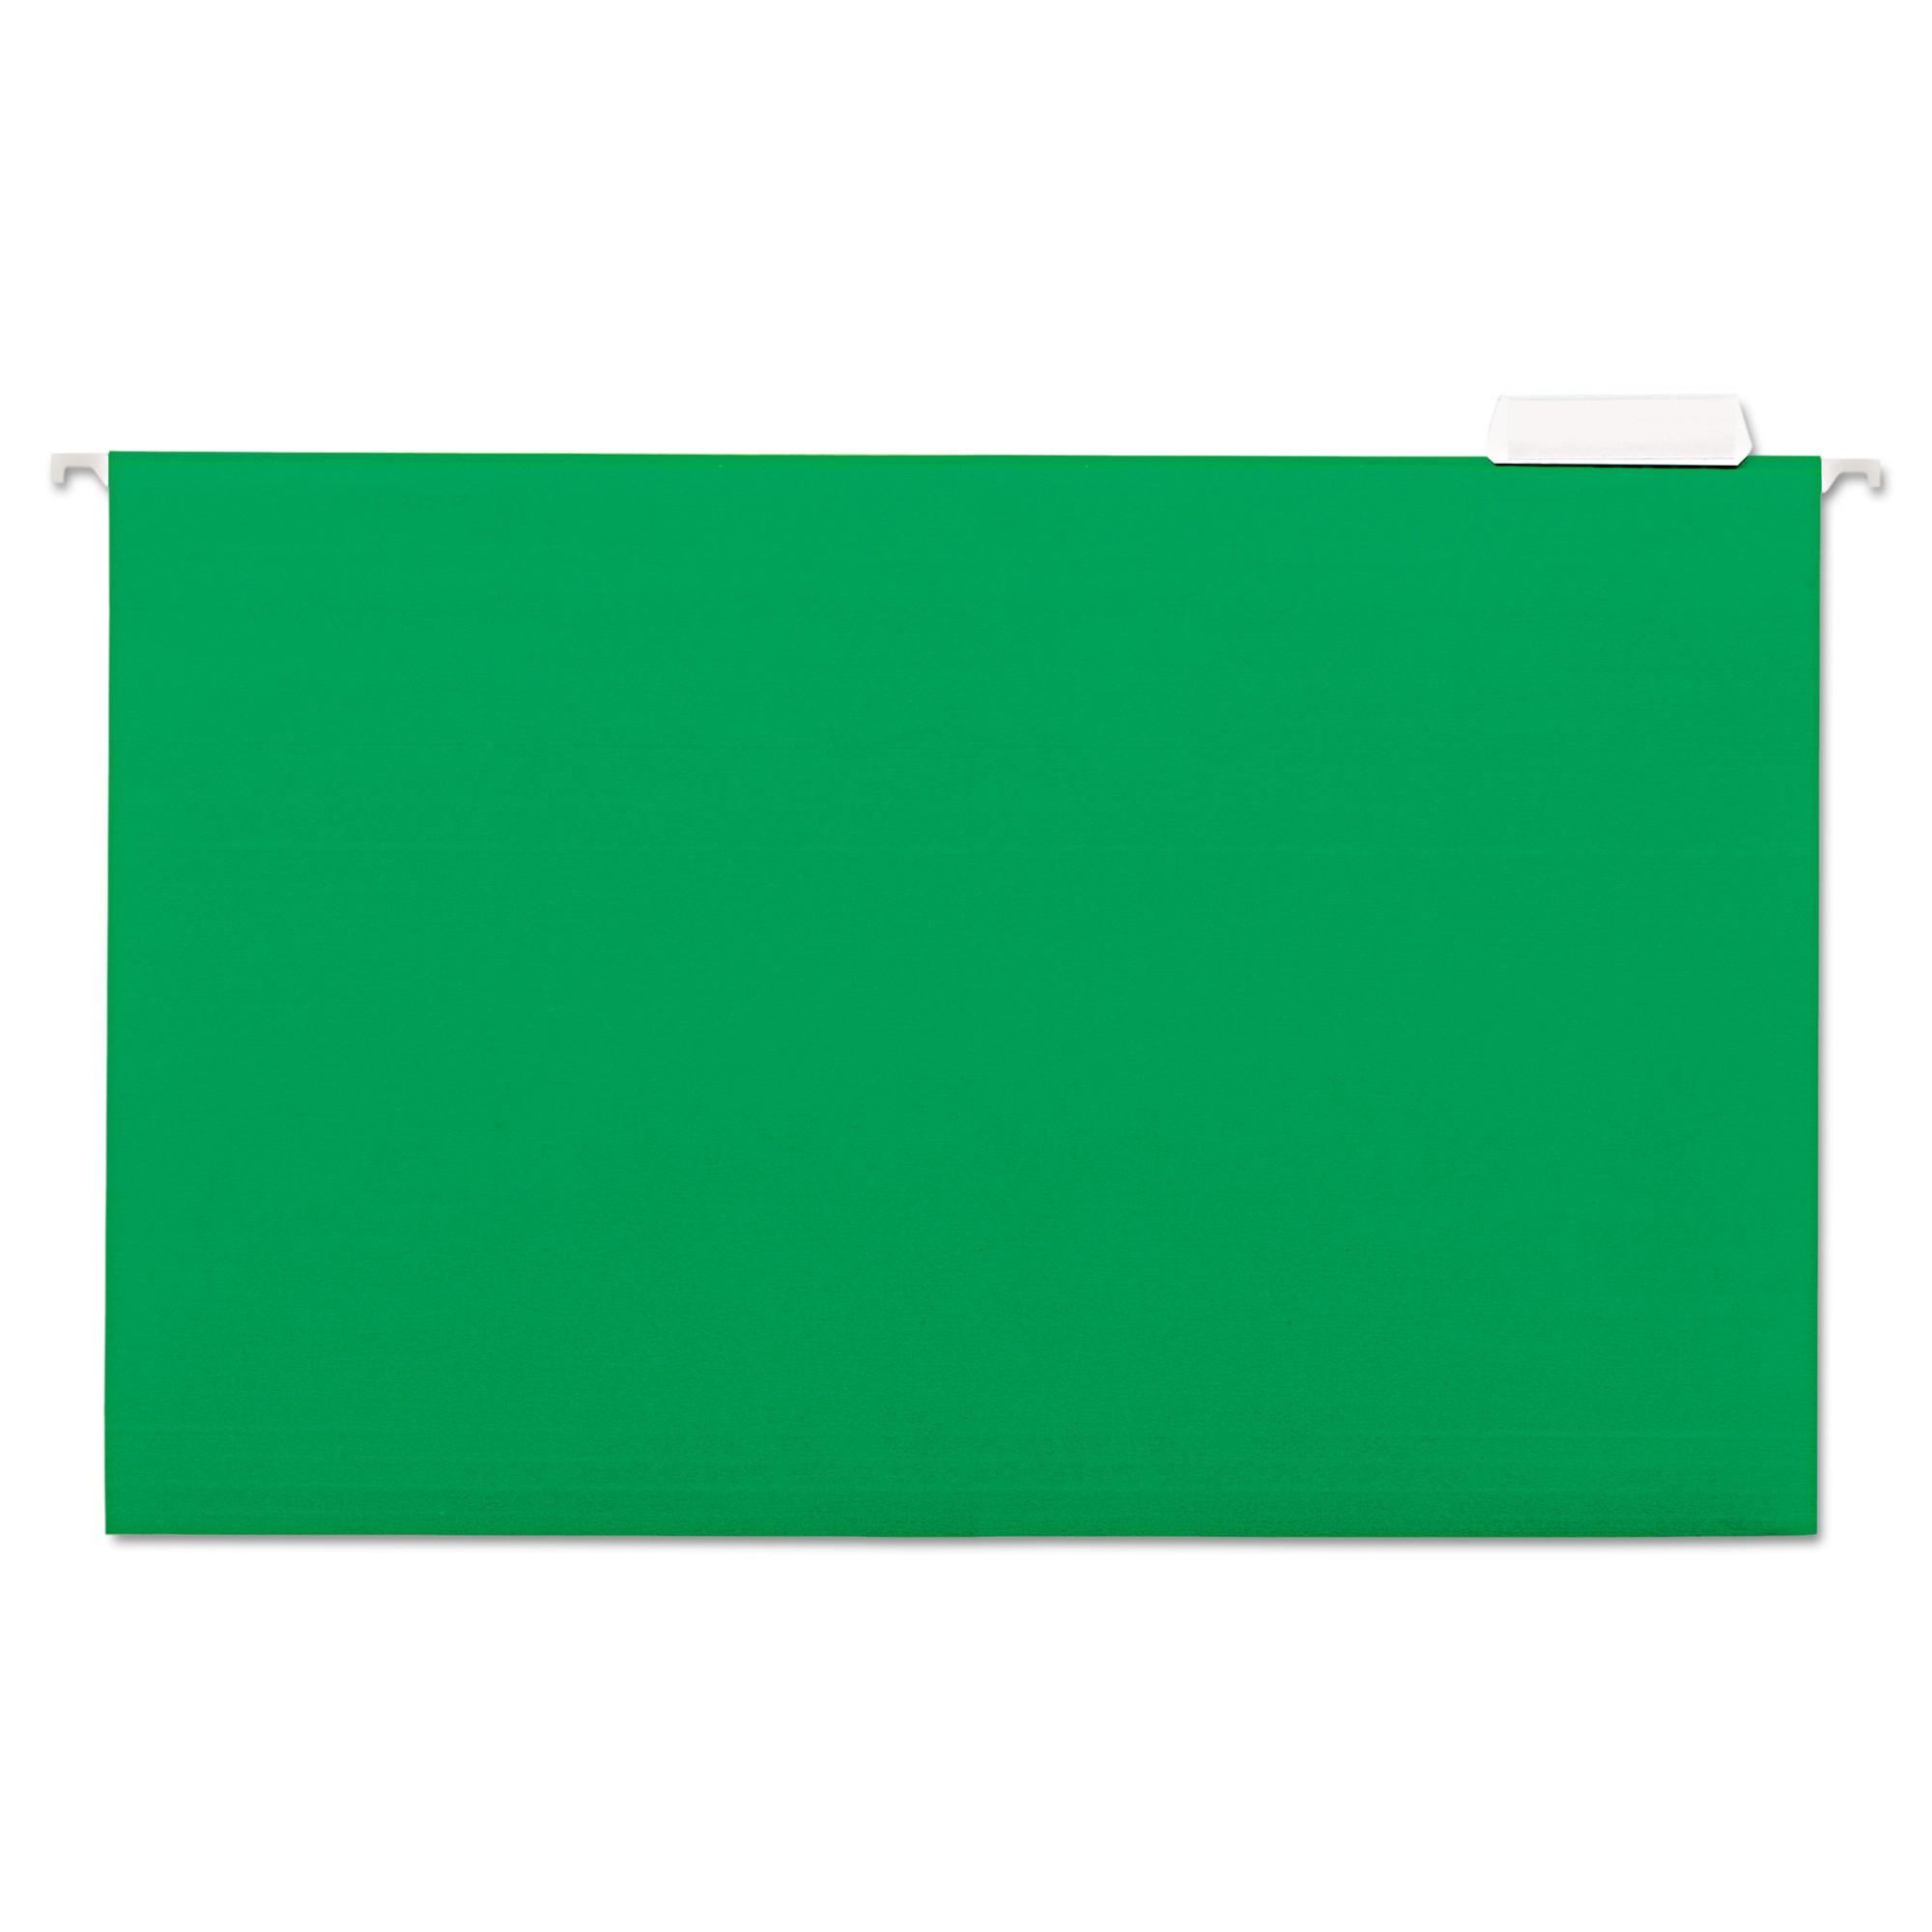 Hanging File Folders, 1/5 Tab, 11 Point Stock, Legal, Green, 25/Box